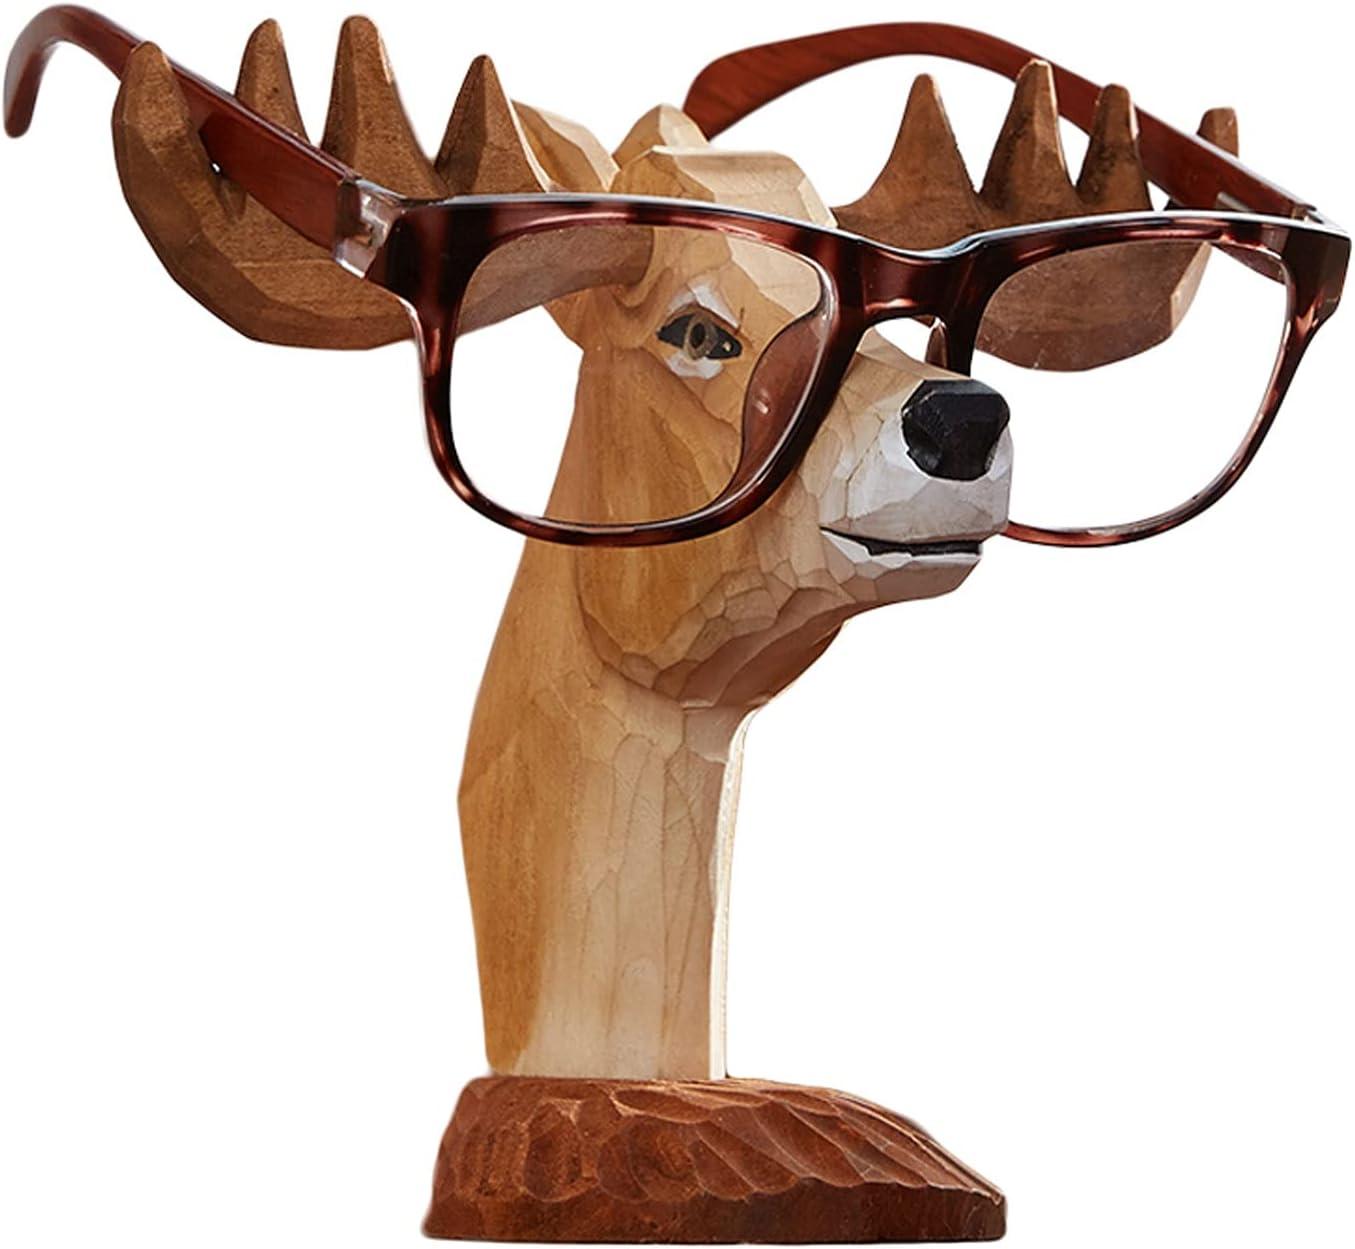 Cheap bargain Sunglasses Rack Holder Creative Ultra-Cheap Deals Handmade Eyegla Deer Carved Wood